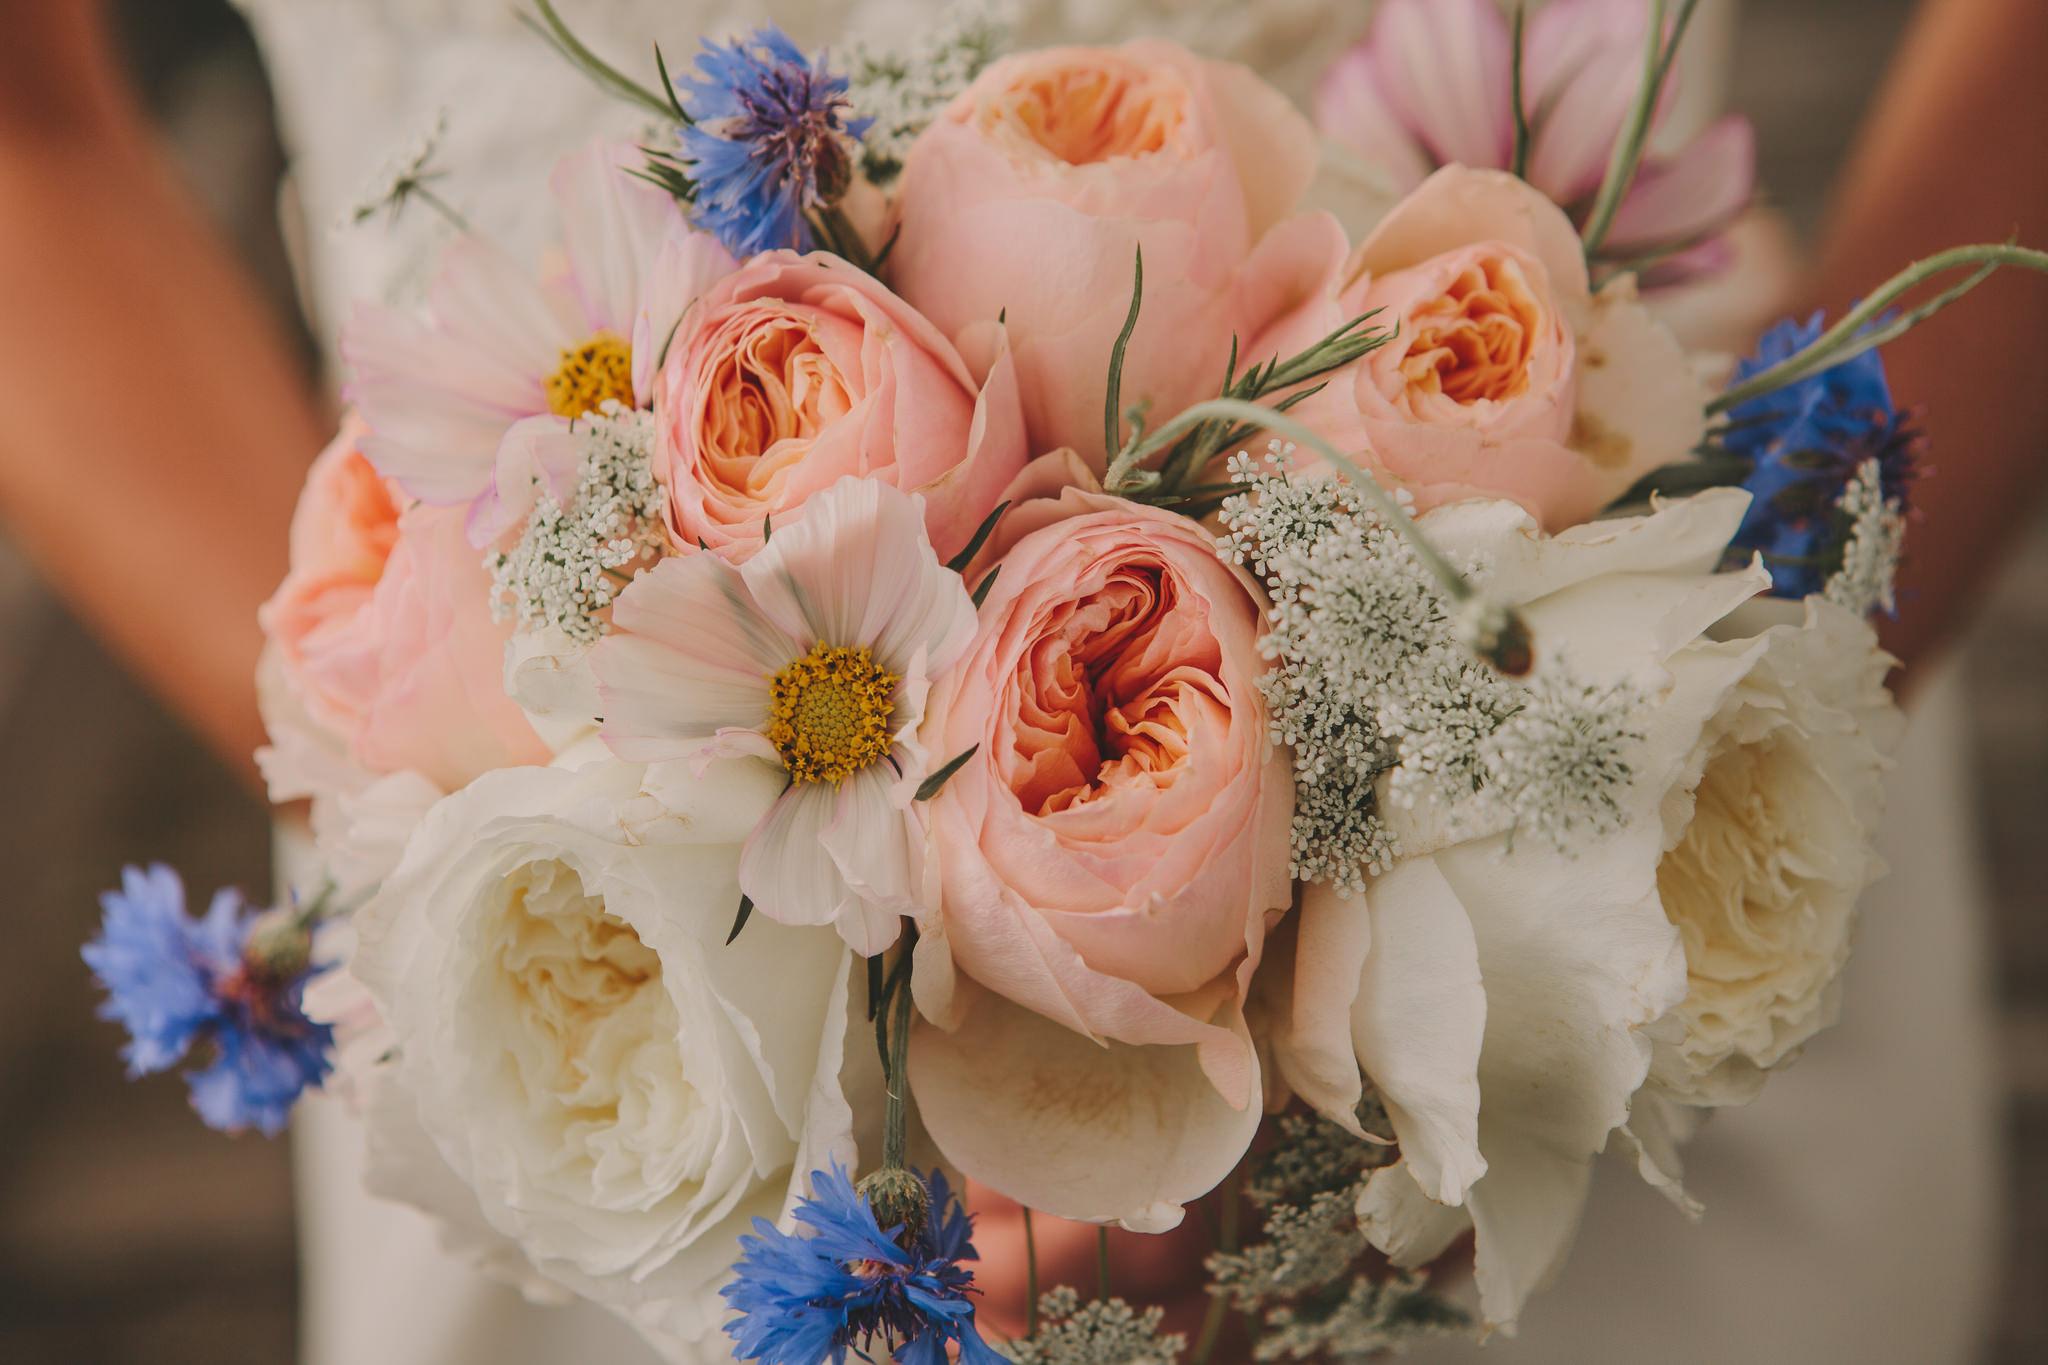 DIY Wedding Bouquet Basics, From Start To Finish